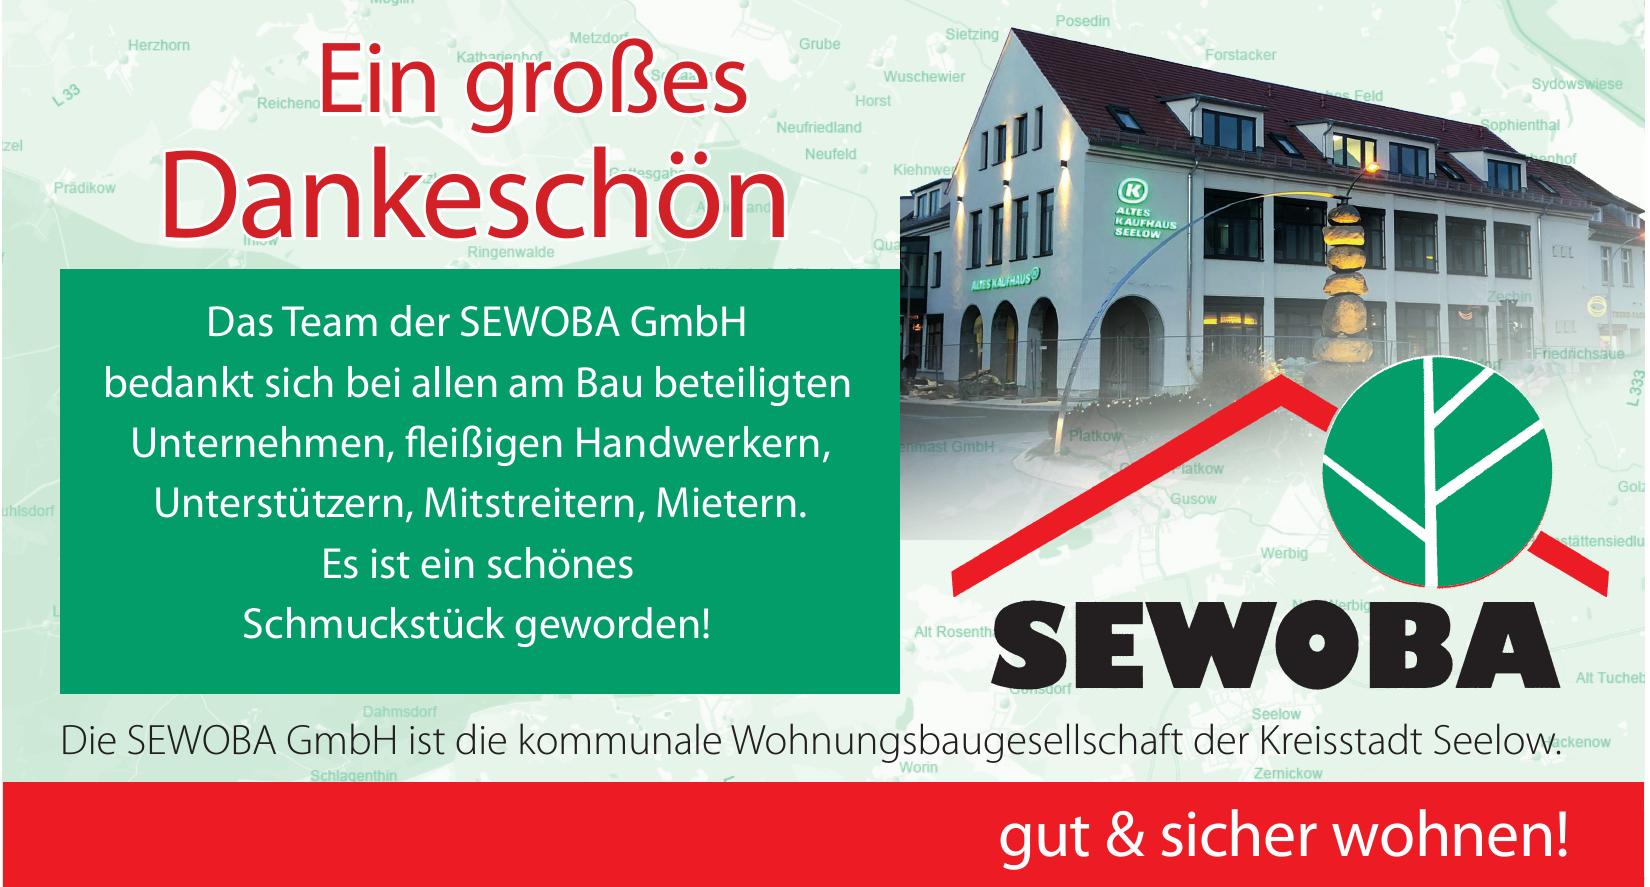 SEWOBA GmbH